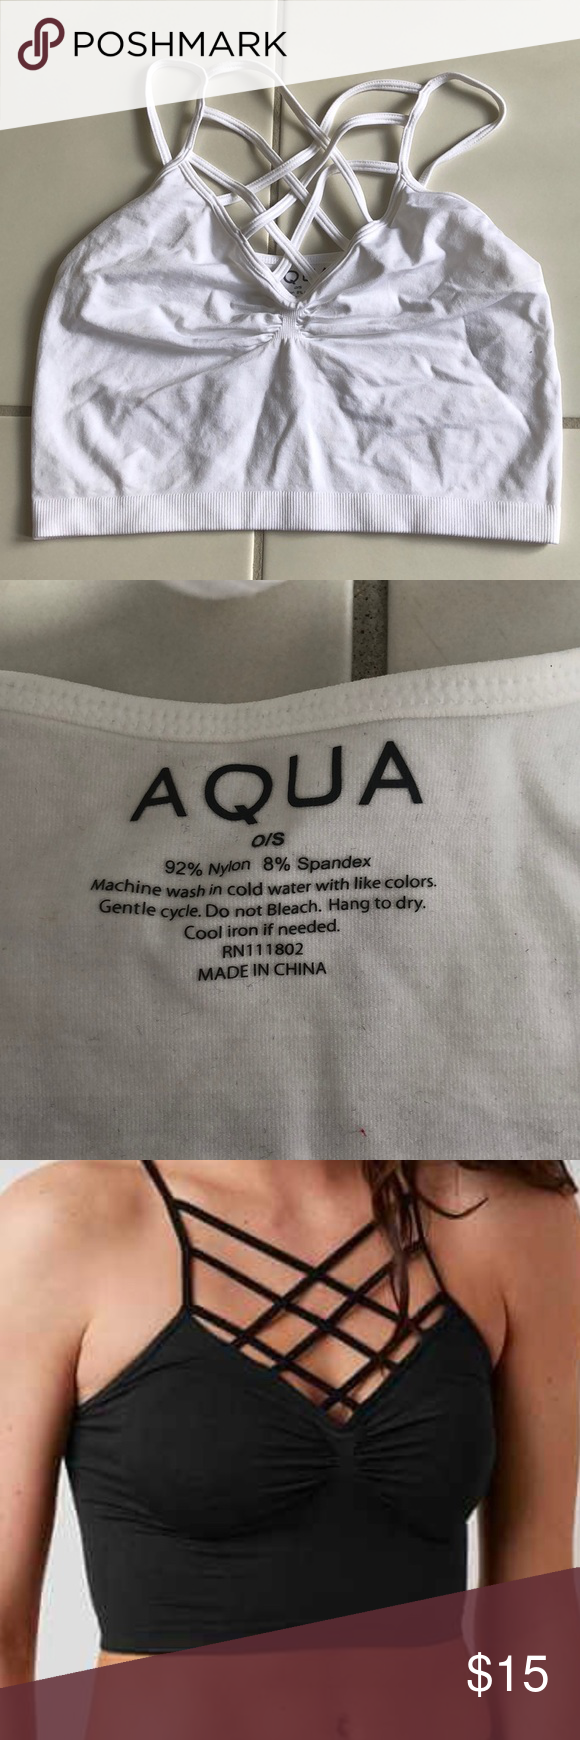 72a2afd20b6 Aqua Caged Bralette Never worn! Stretchy seamless fabric! Aqua Intimates   Sleepwear  Bras